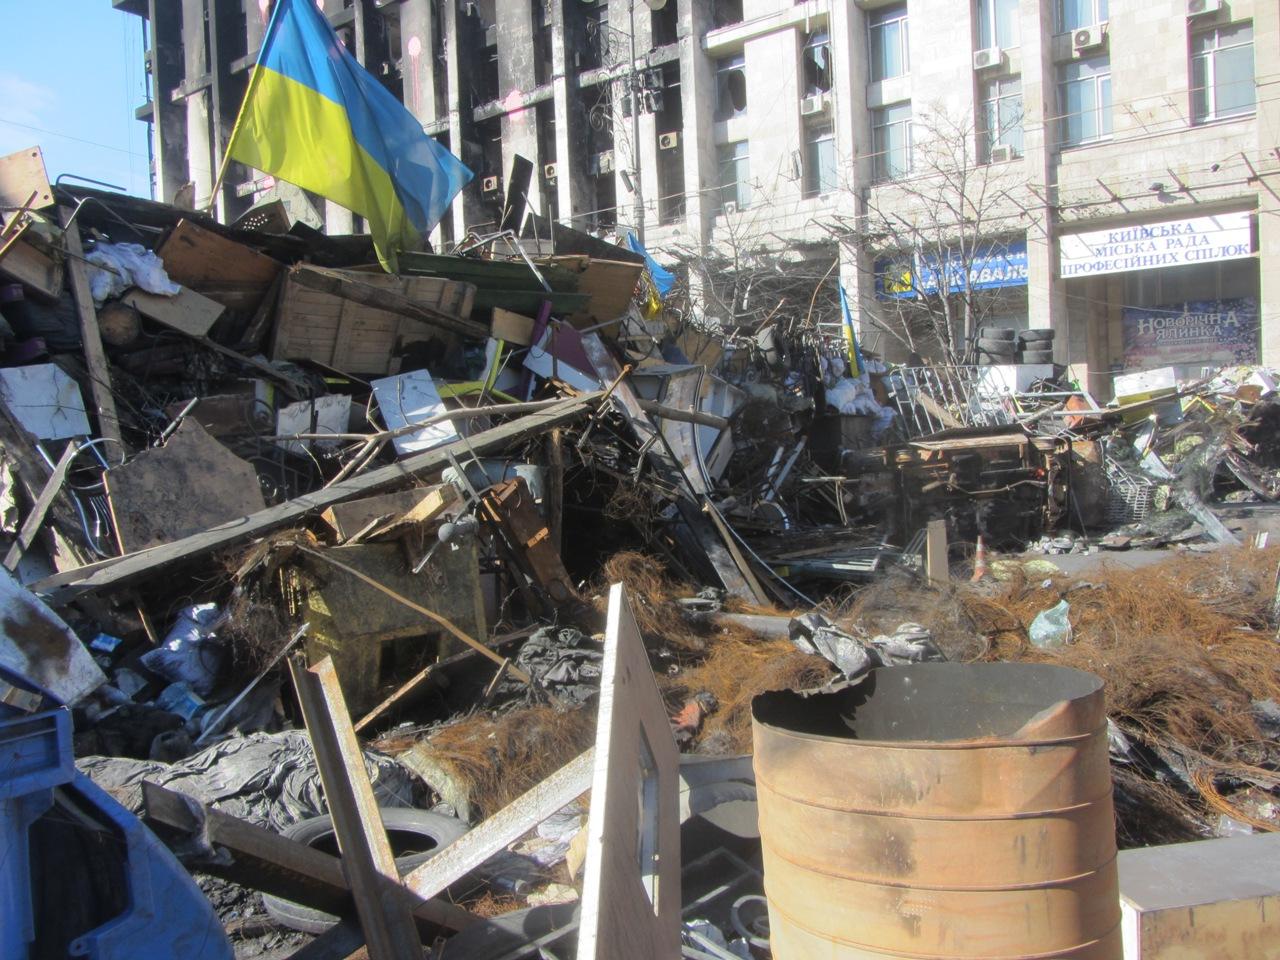 Украина фото с майдана, Майдан независимости сегодня,